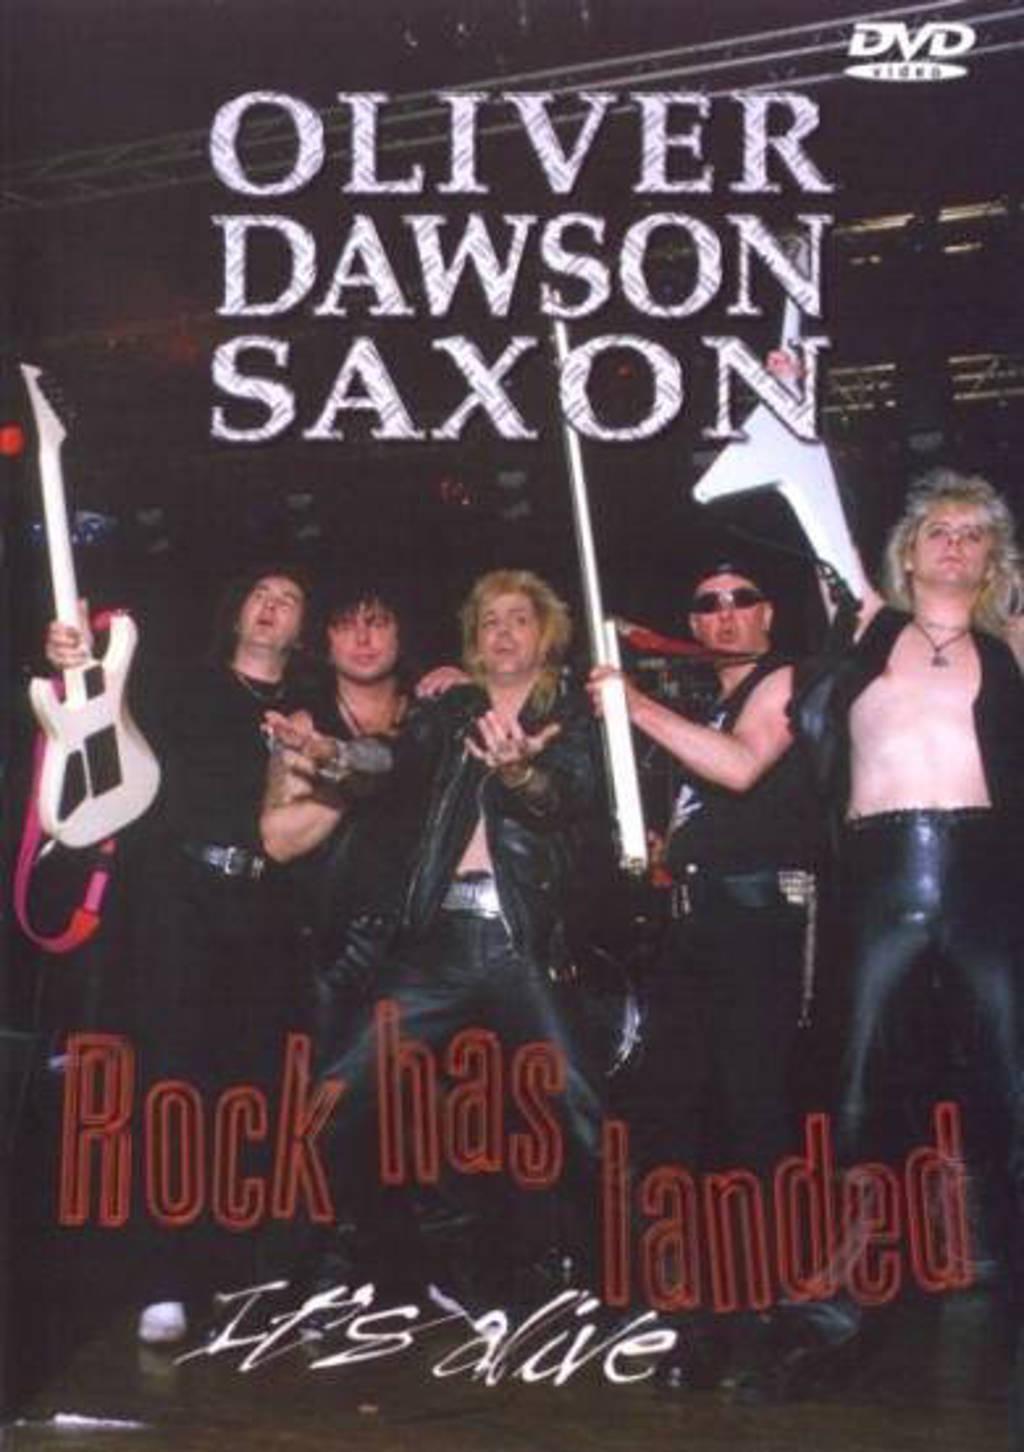 Oliver Dawson Saxon - rock has landed (DVD)